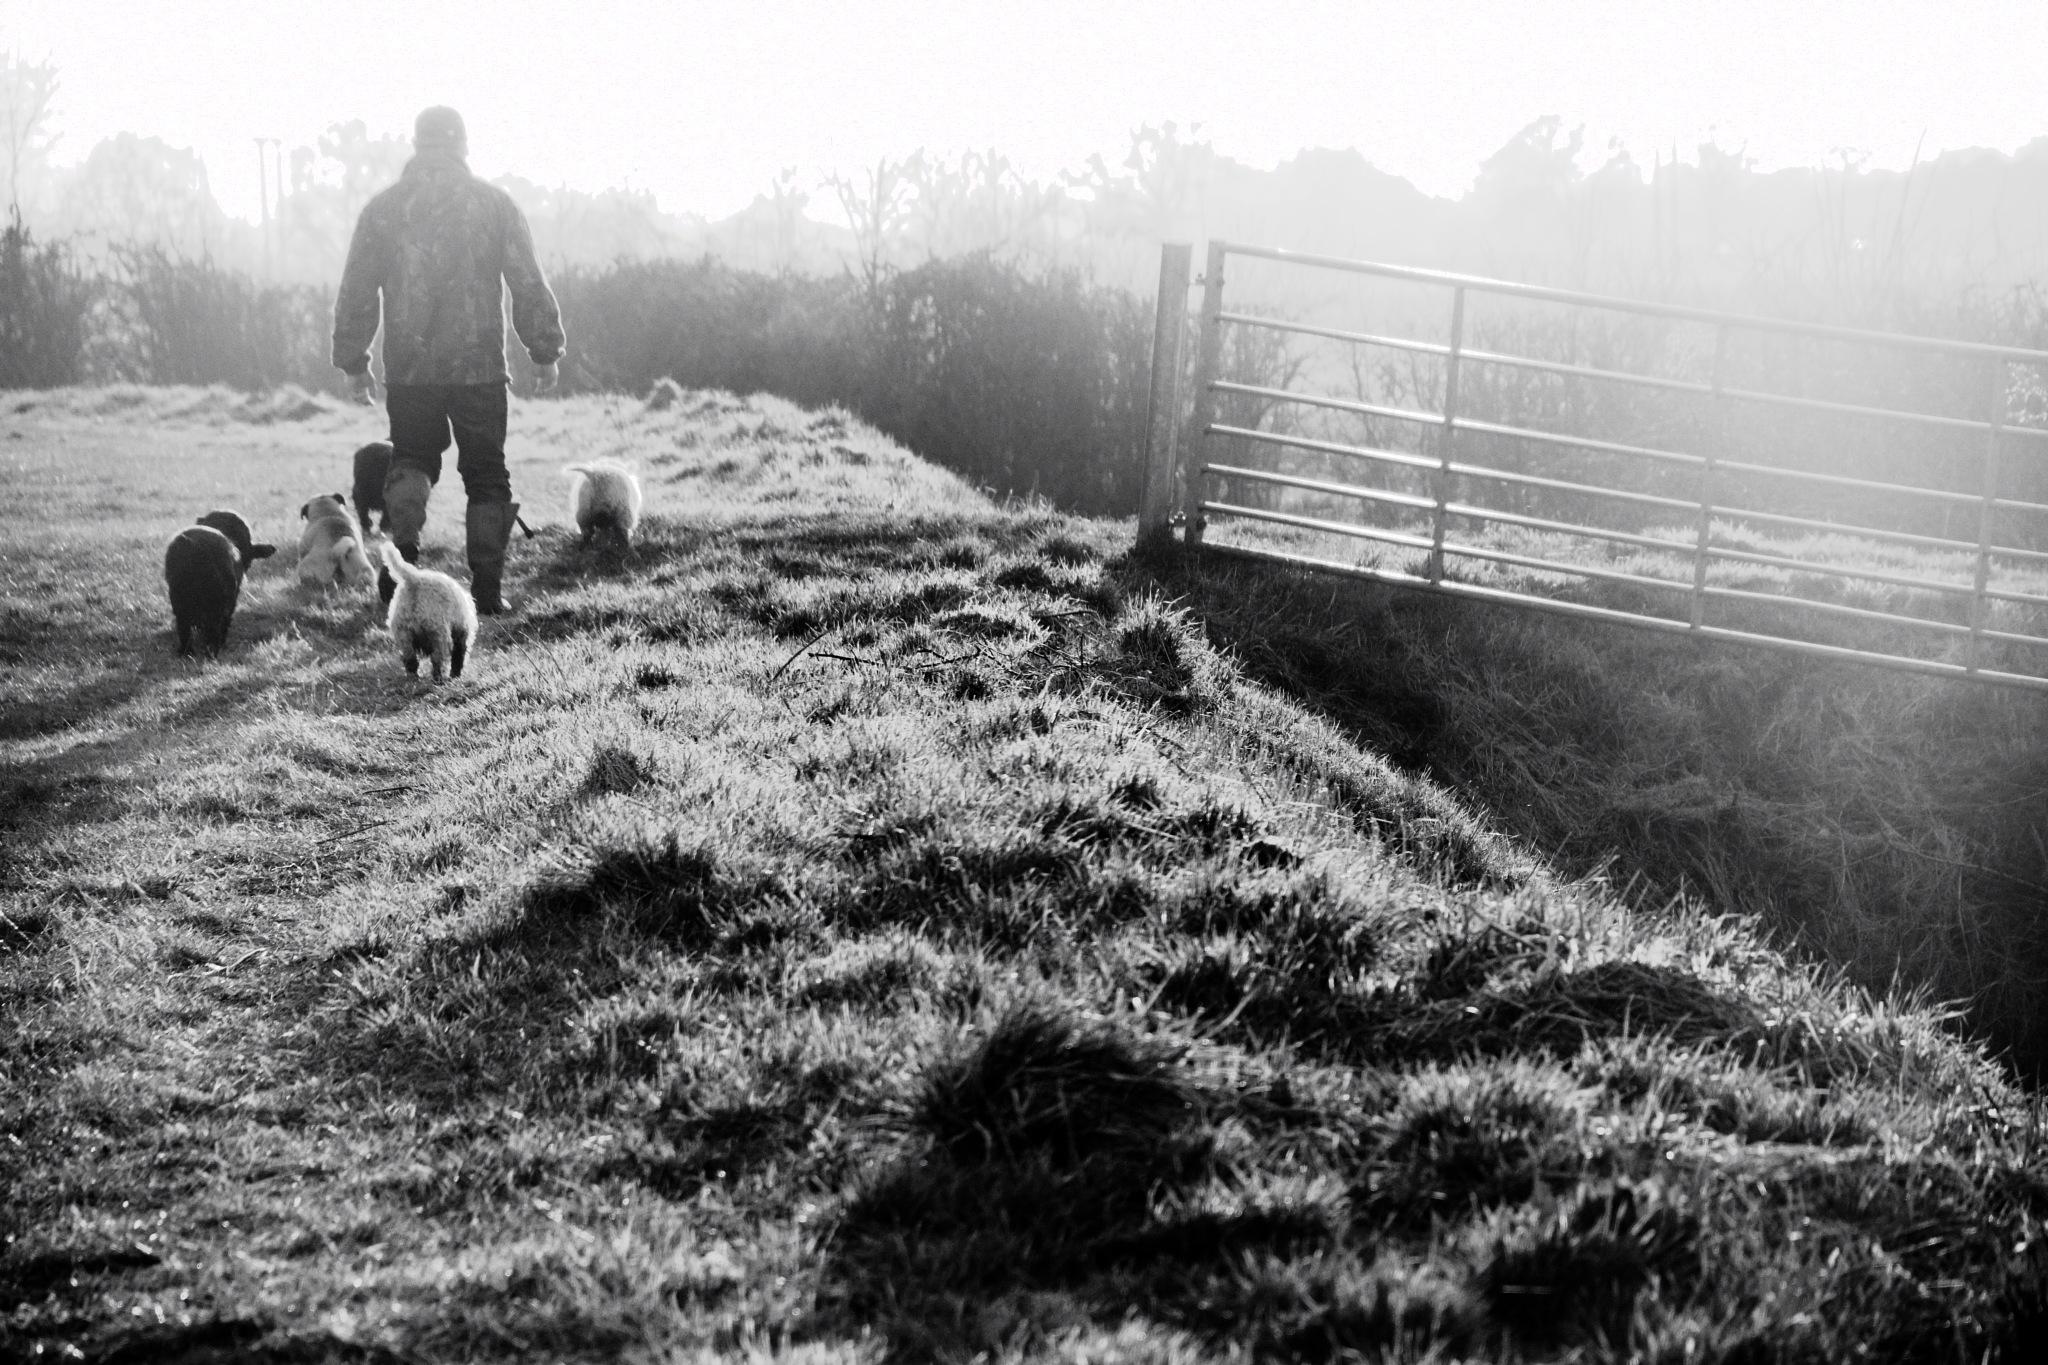 walk in the mist by Ian Alastair Trenor Photography